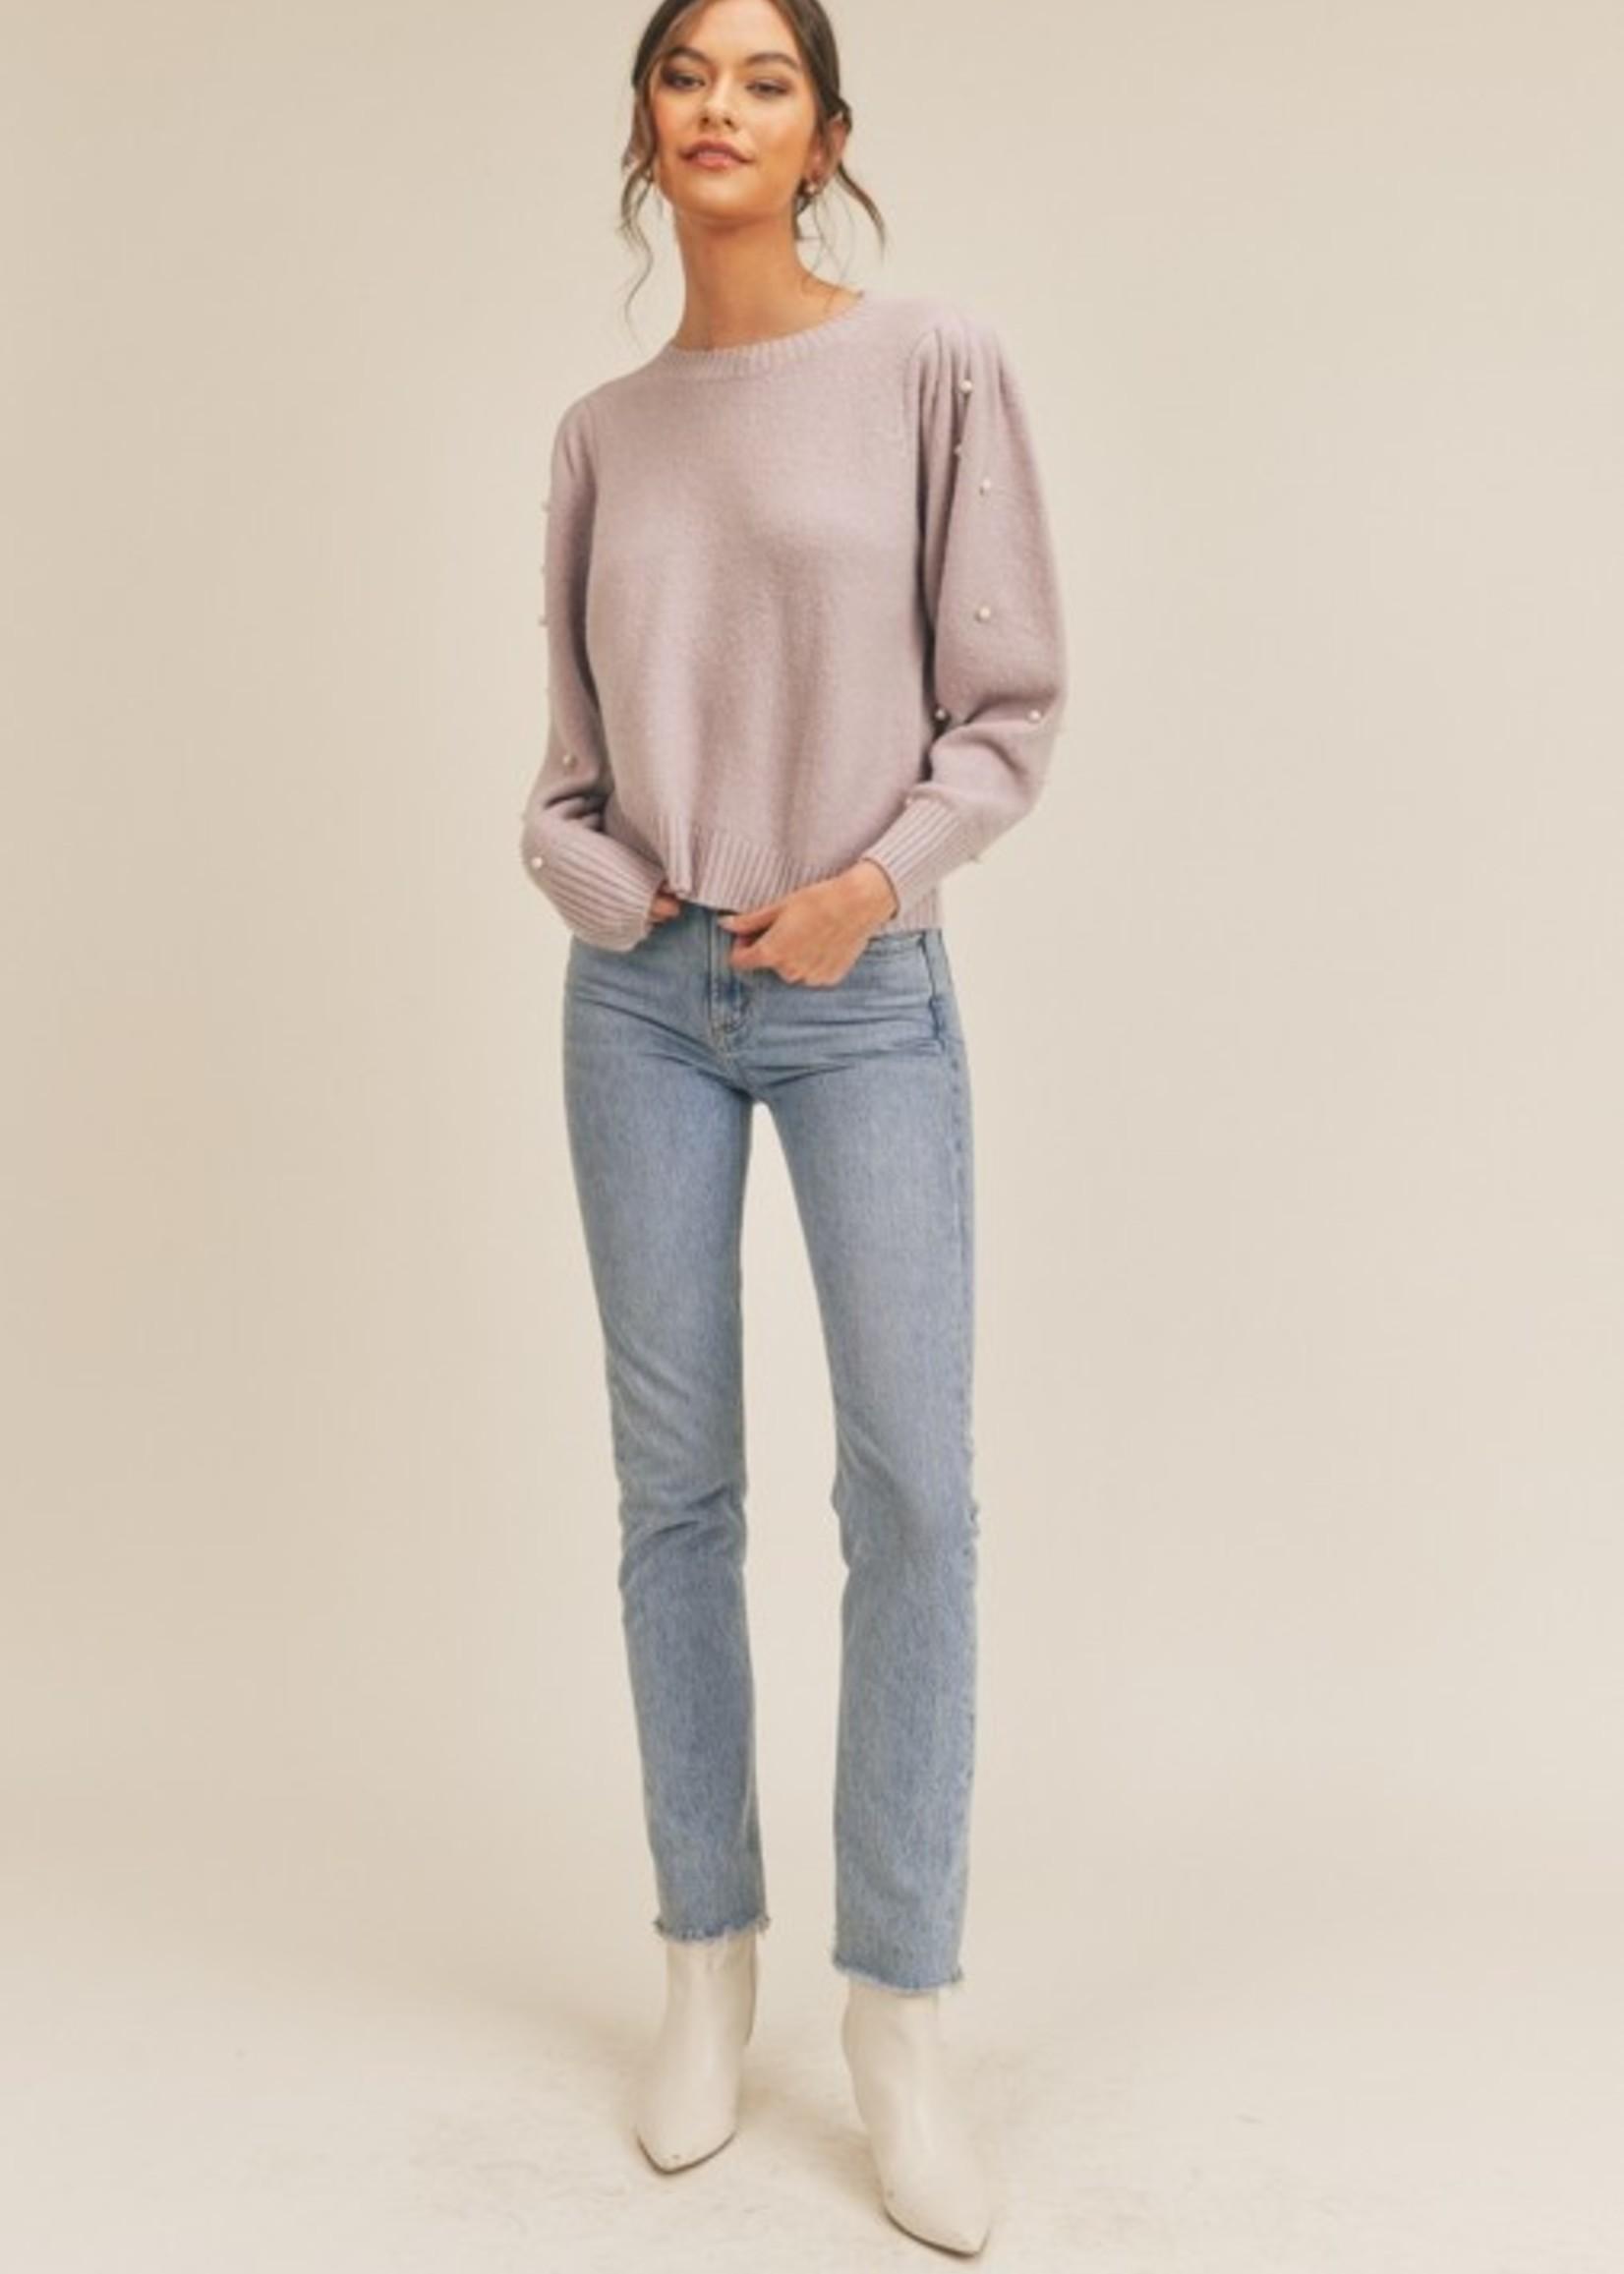 Lush Pearl Embellished Sweater - Lilac